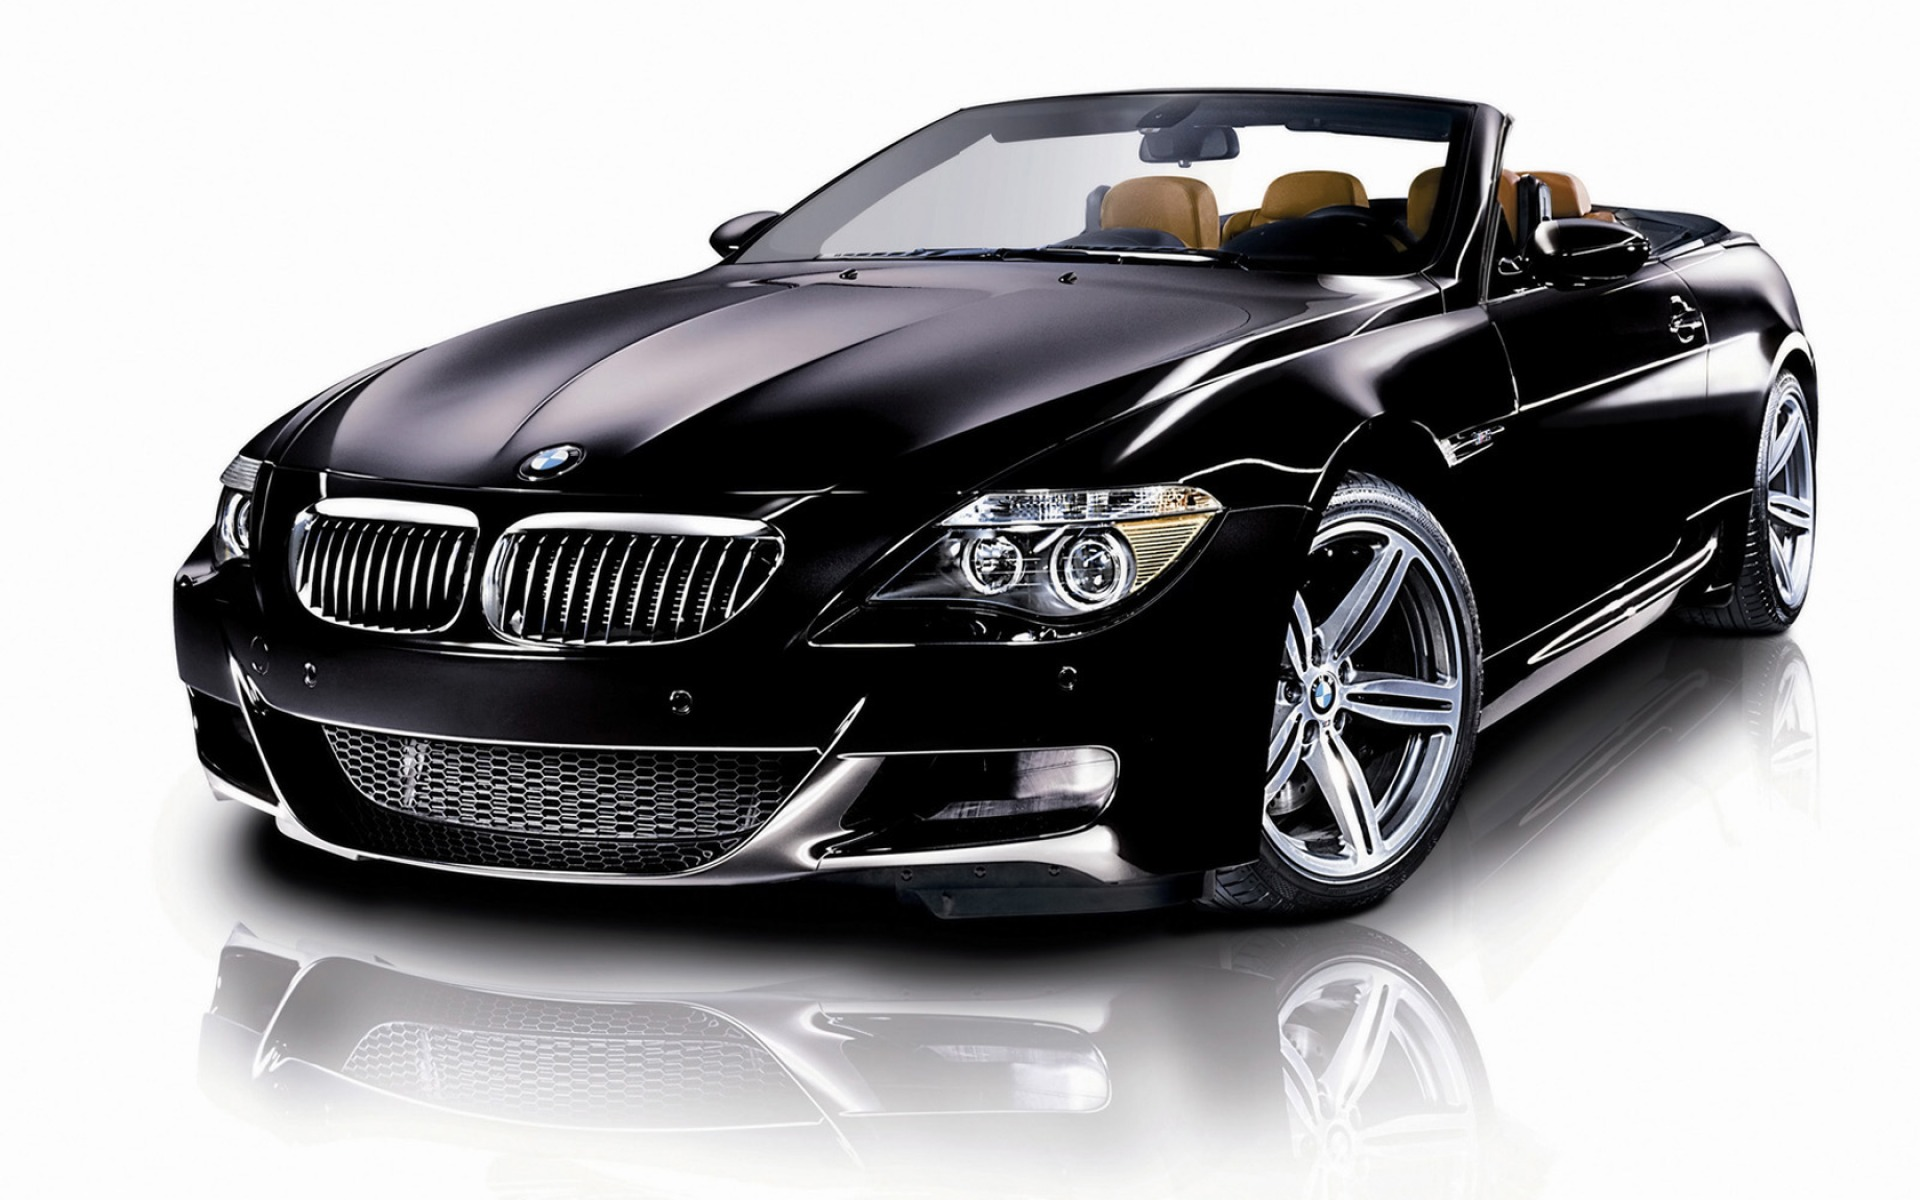 Large car payment